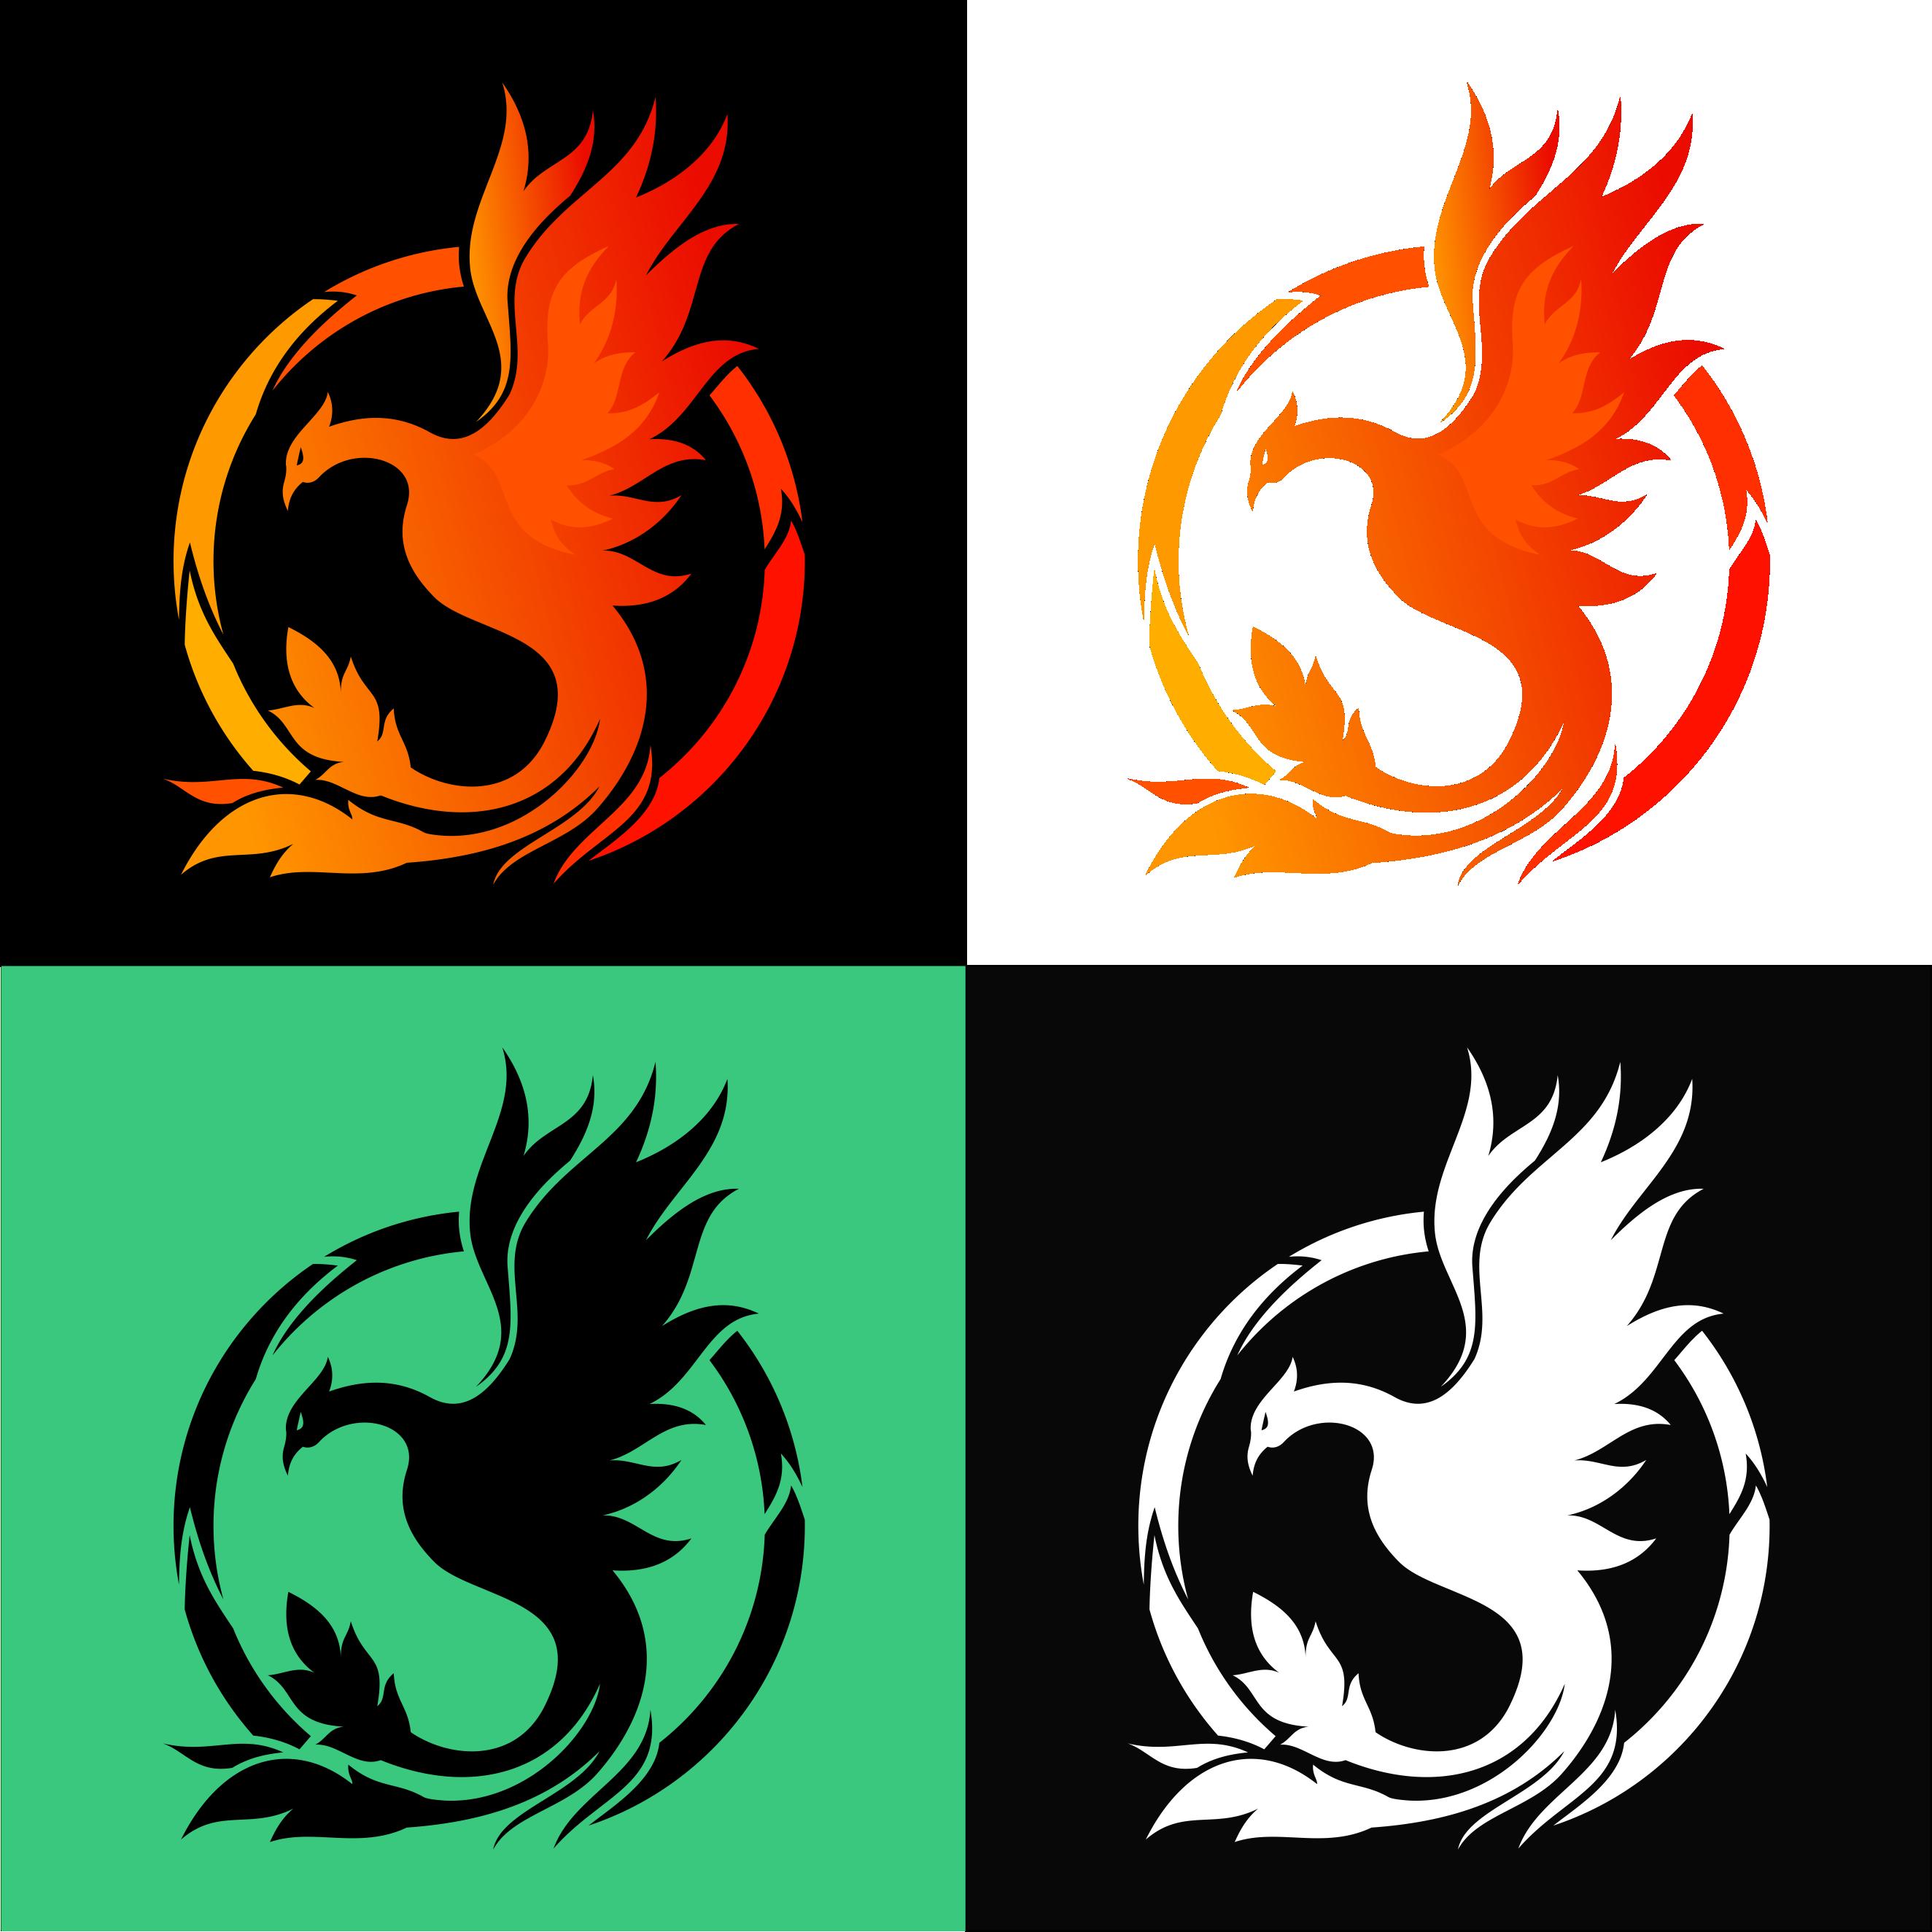 Phoenix clipart graphic design. Contest jerrybanfield steemit banfield